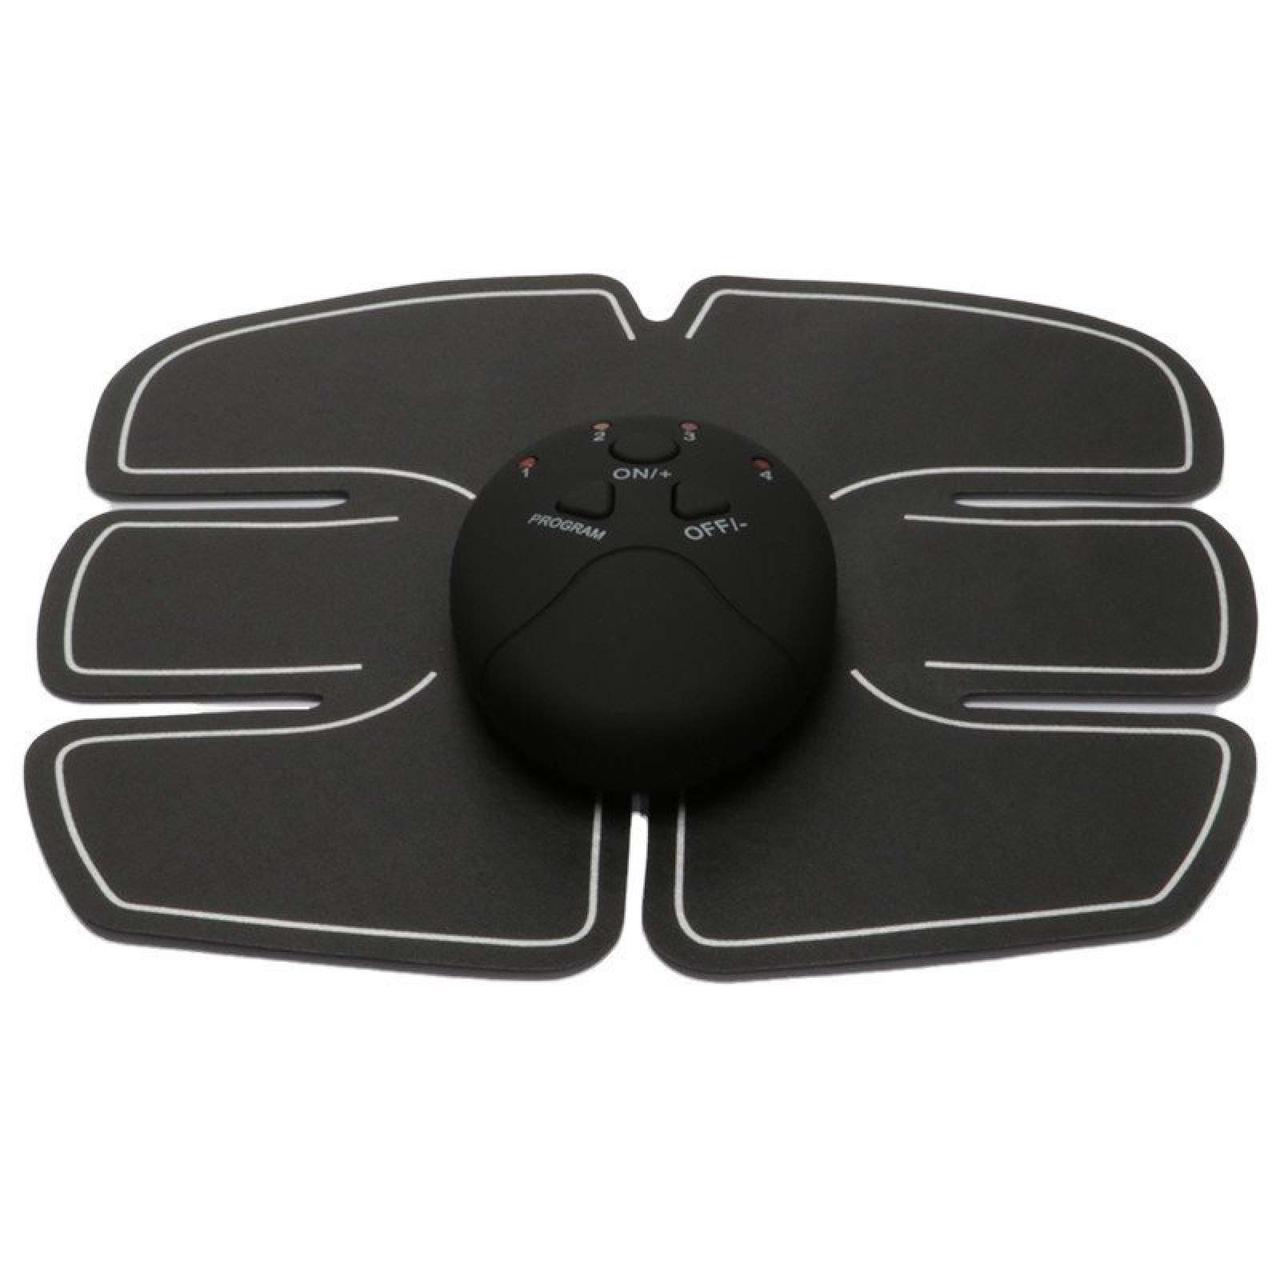 Миостимулятор Smart Fitness Ems Trainer Fit Boot Toning 3в1 R130430